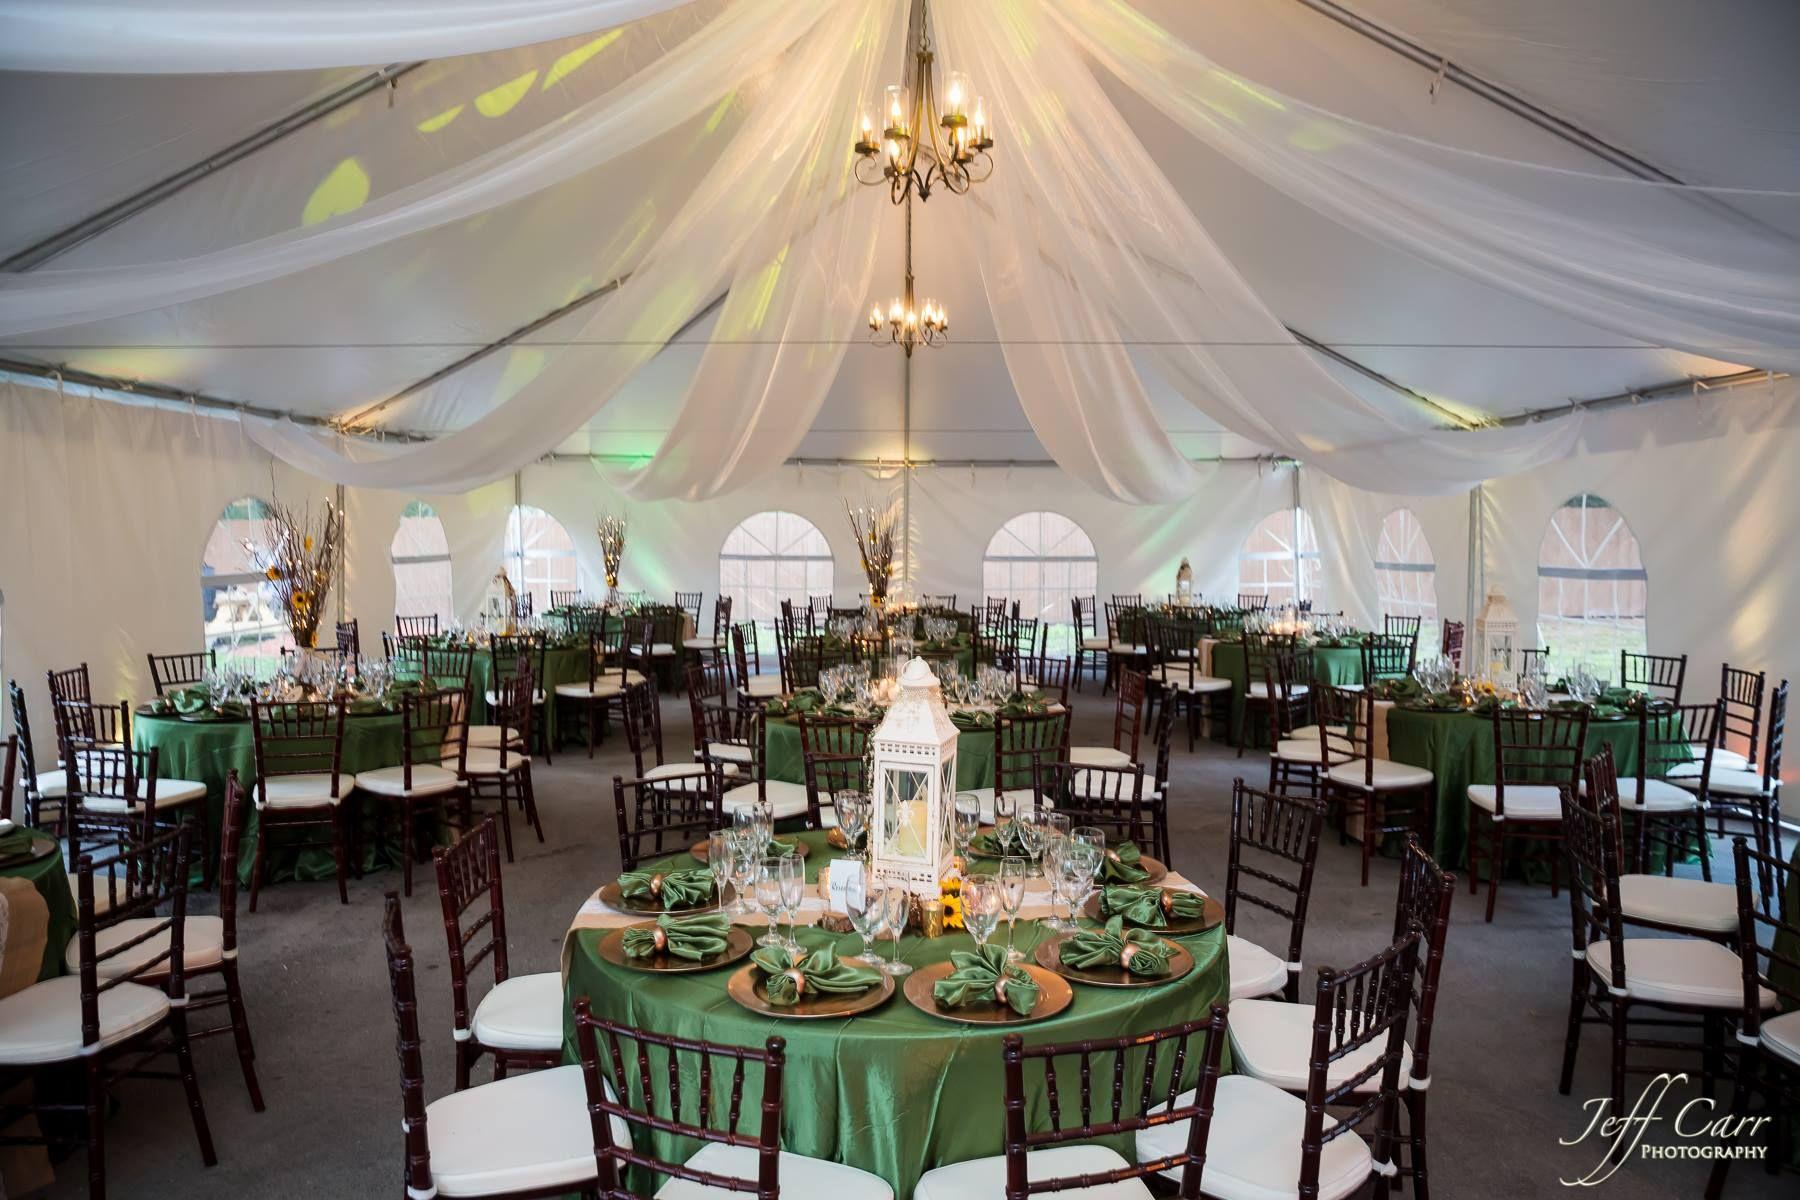 Wedding Tent Green Wedding Chiavari Chairs Draping Table Setting Inspiration Photo C Wedding Table Settings Wedding Catering Table Setting Inspiration